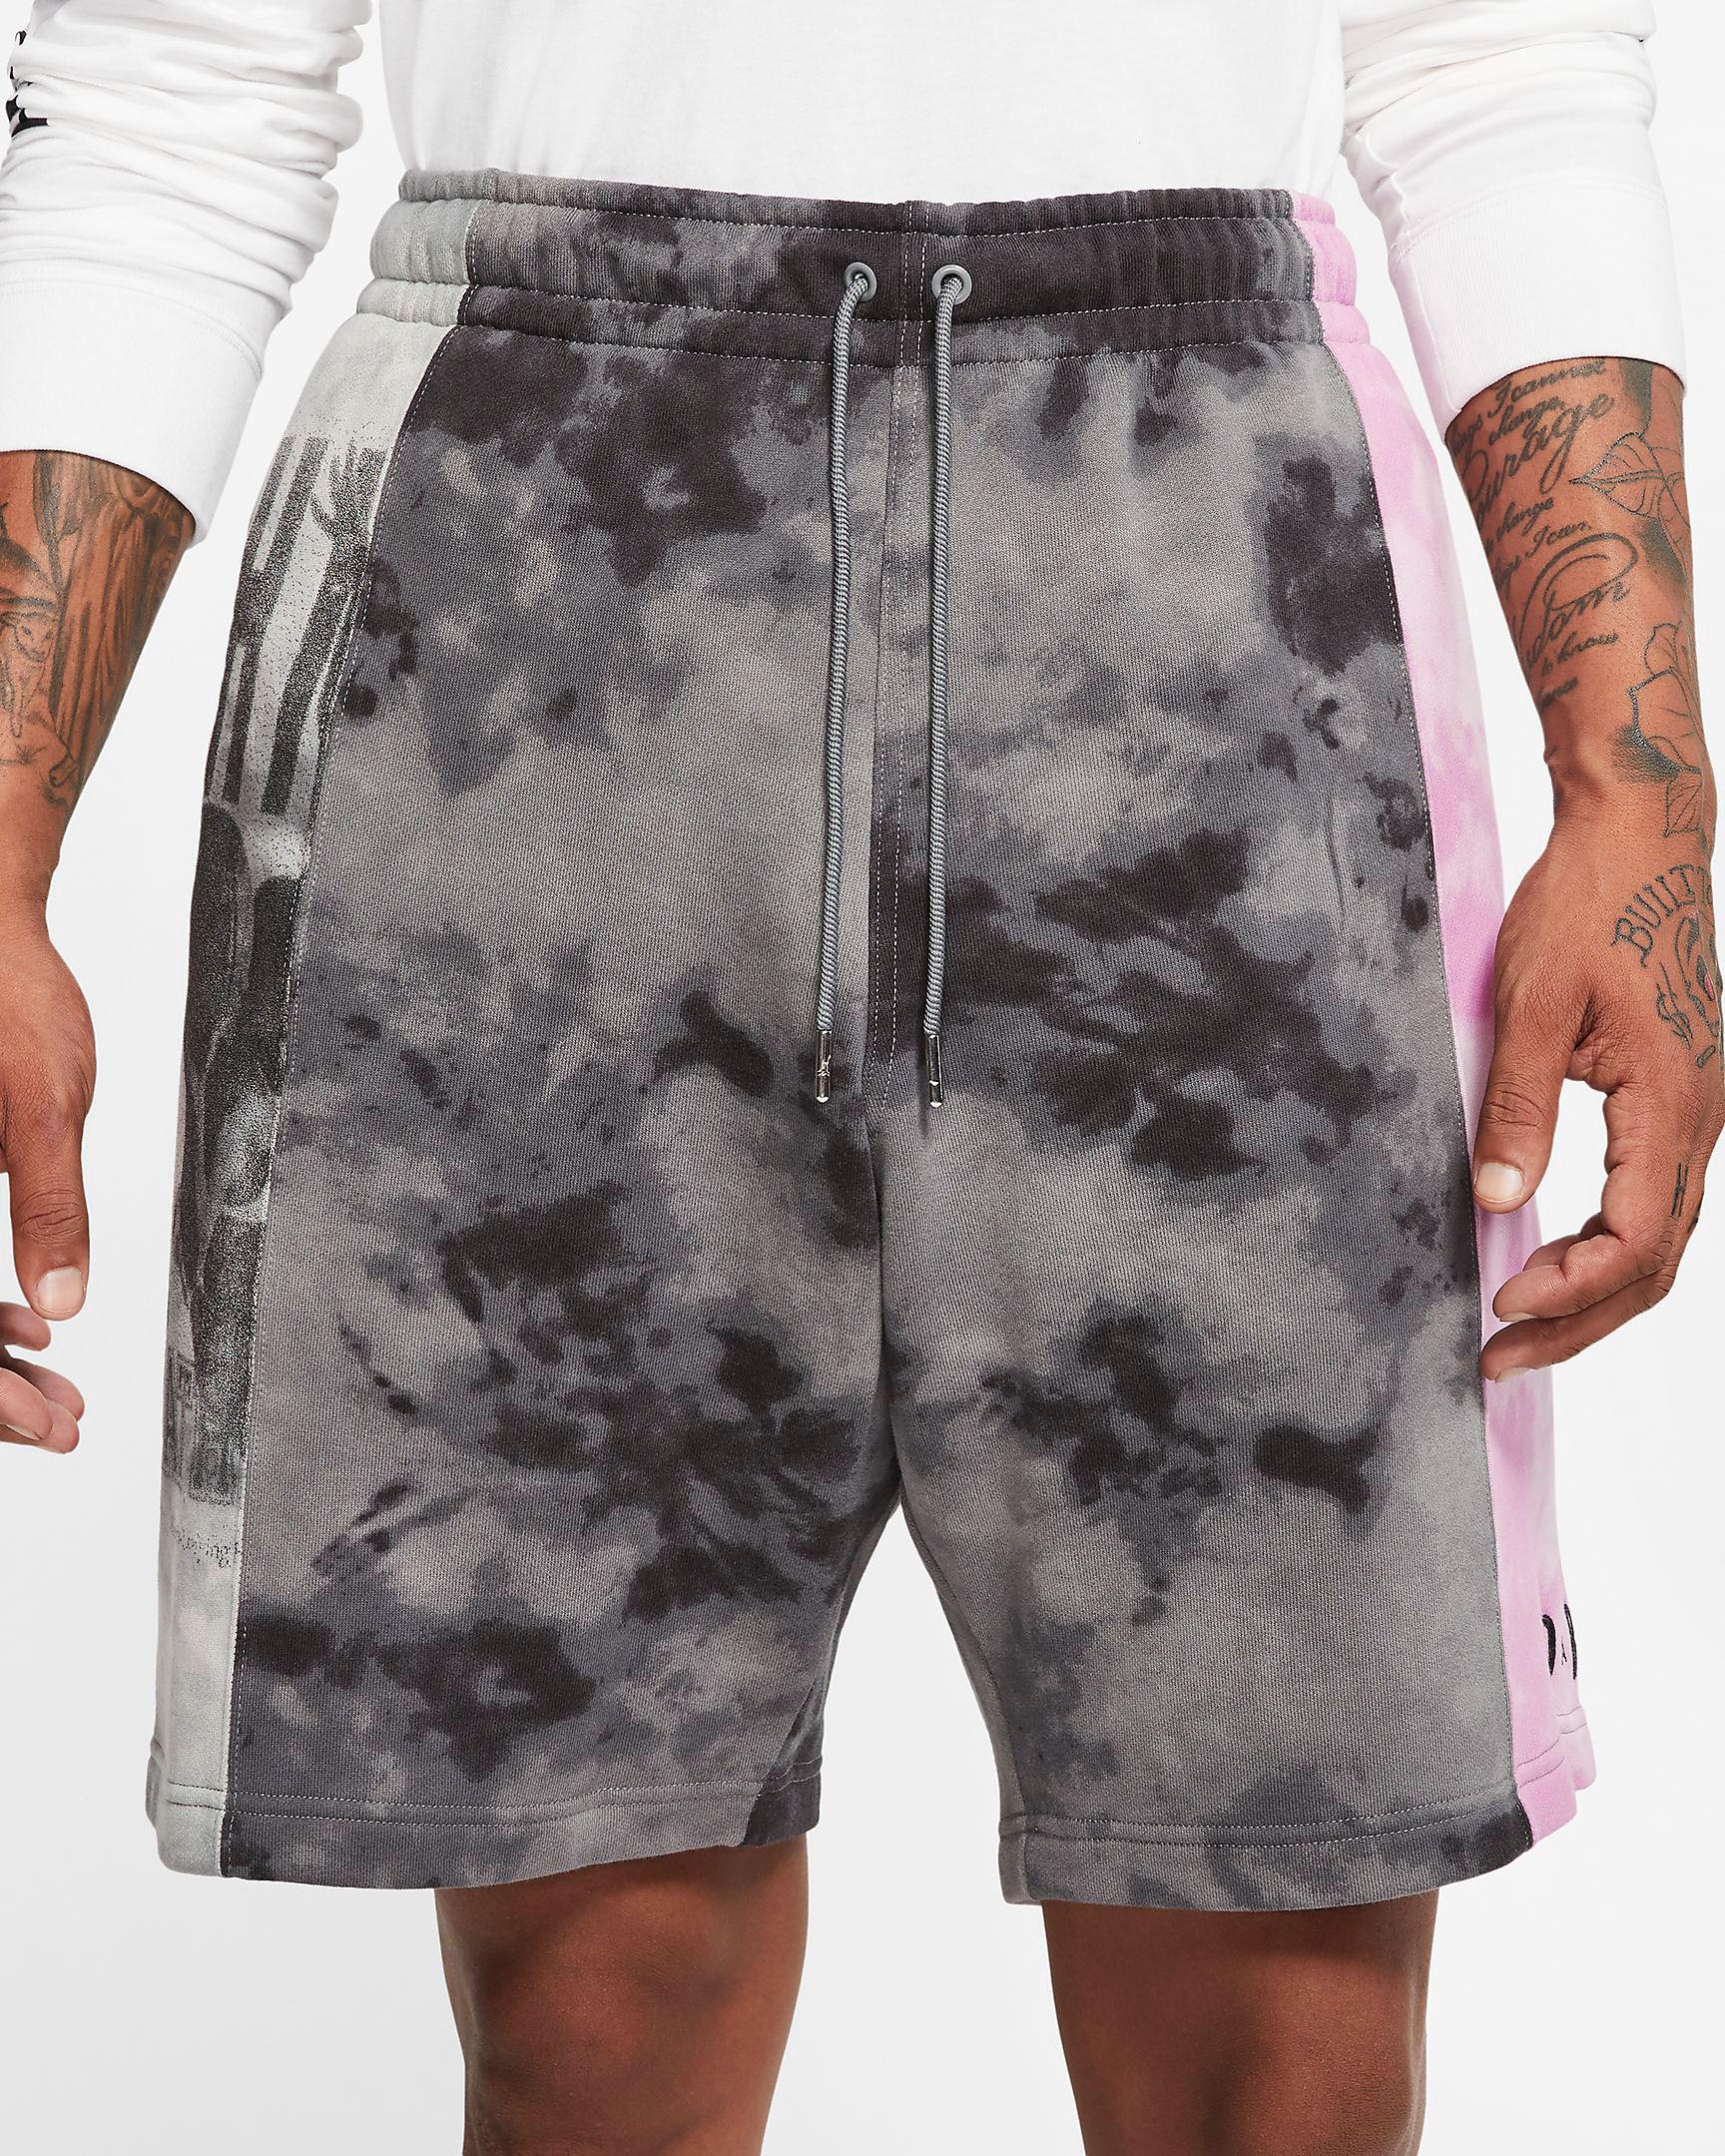 jordan-9-black-smoke-grey-shorts-1